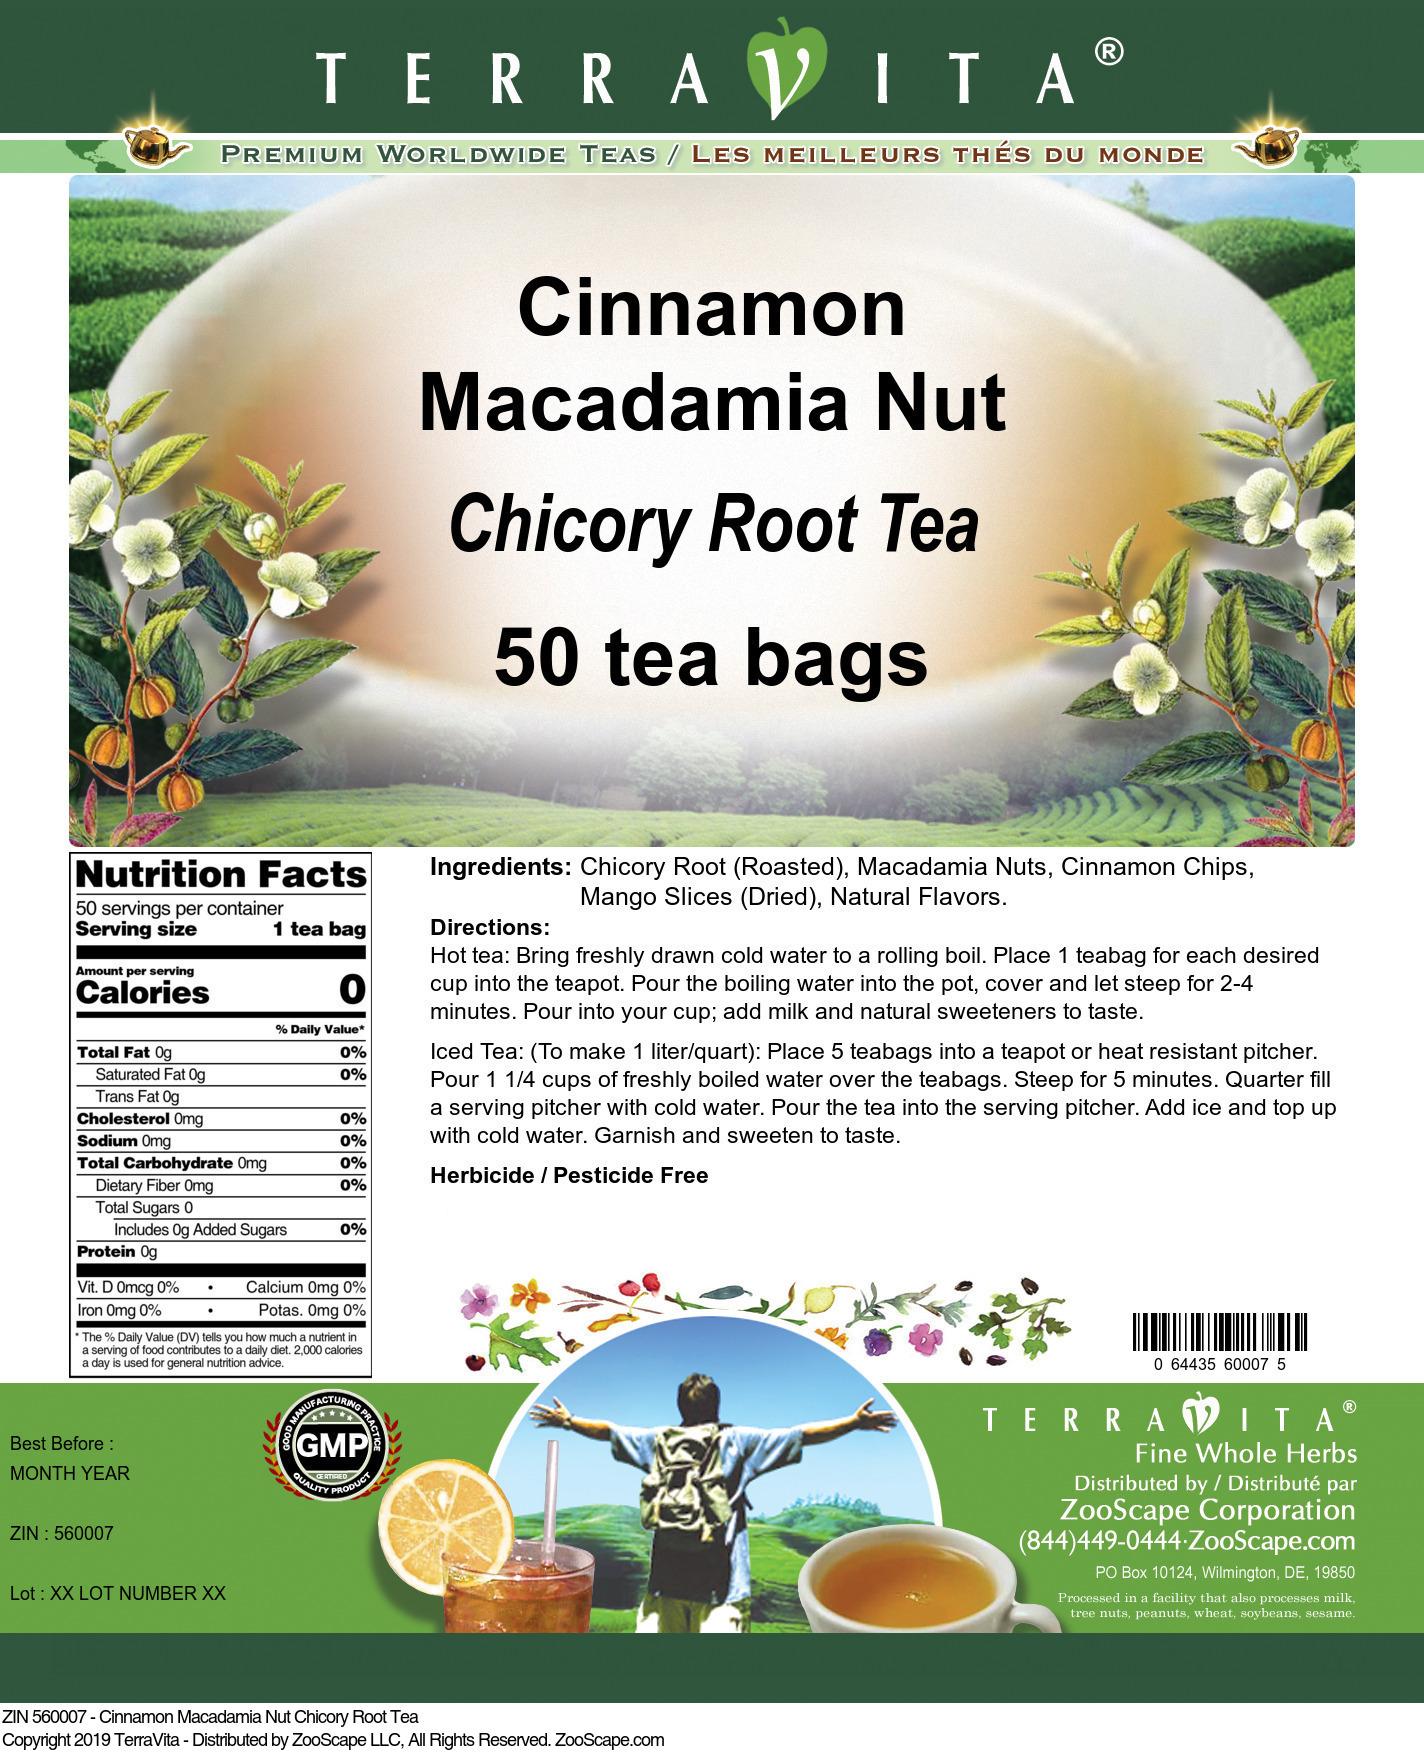 Cinnamon Macadamia Nut Chicory Root Tea